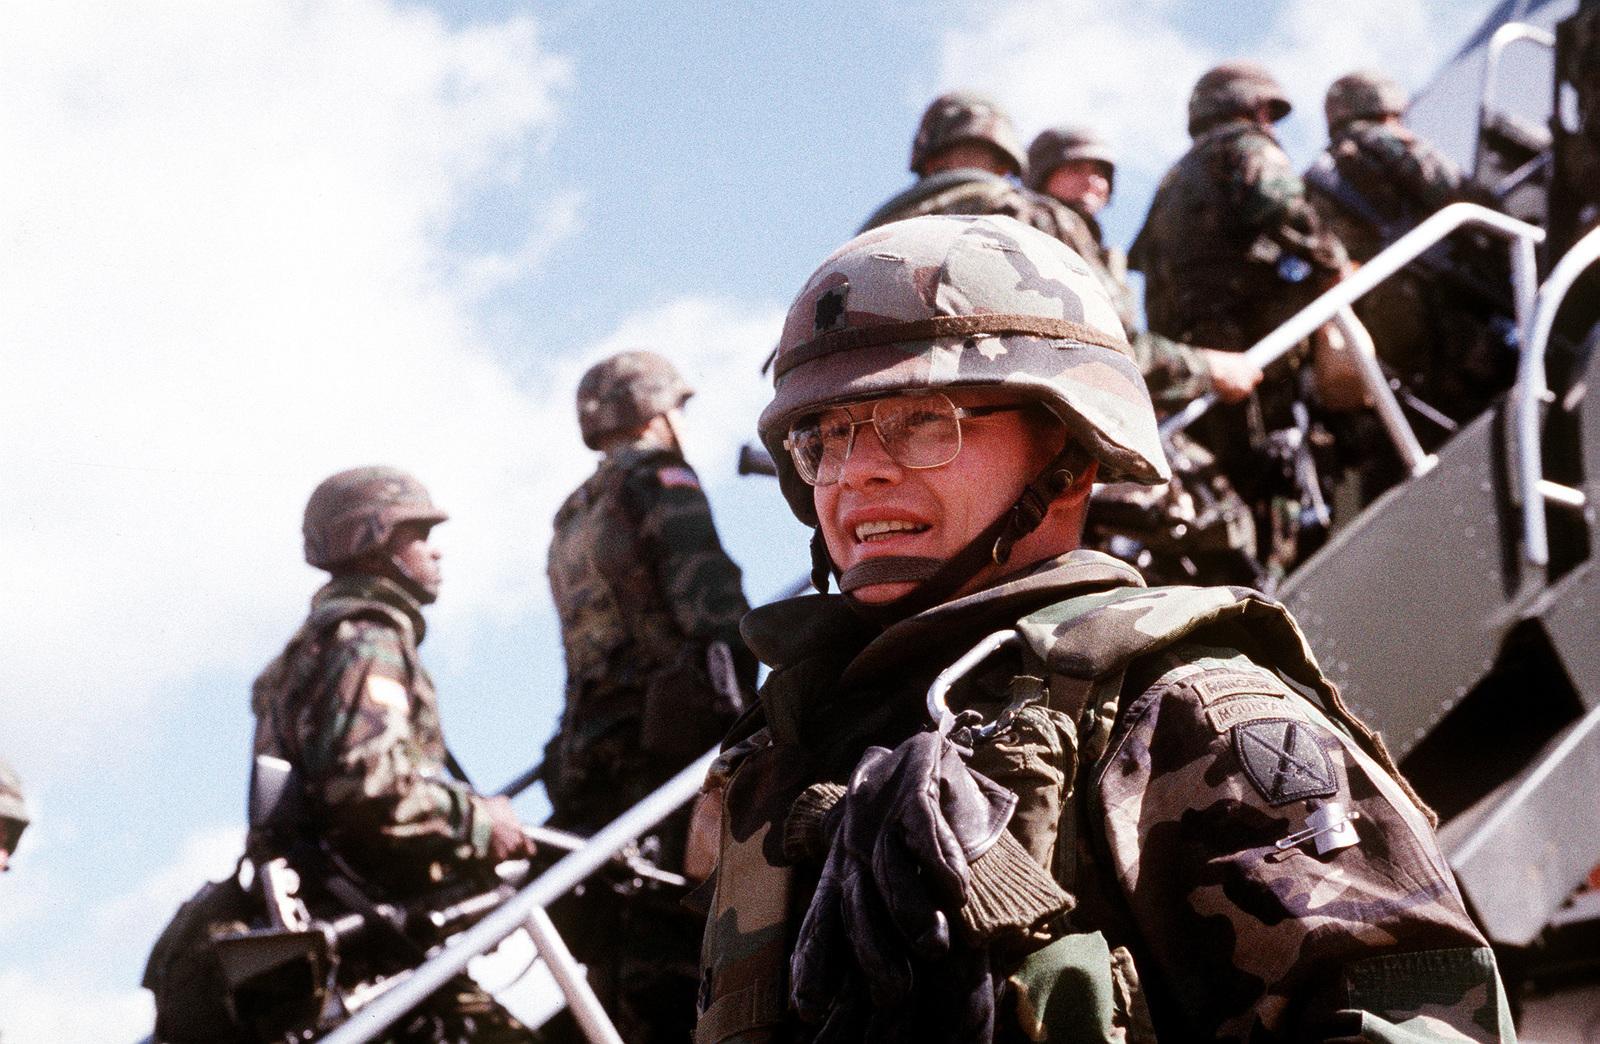 LT  COL  Hawrylak, 1ST Platoon, 22nd Infantry, Fort Drum, NY